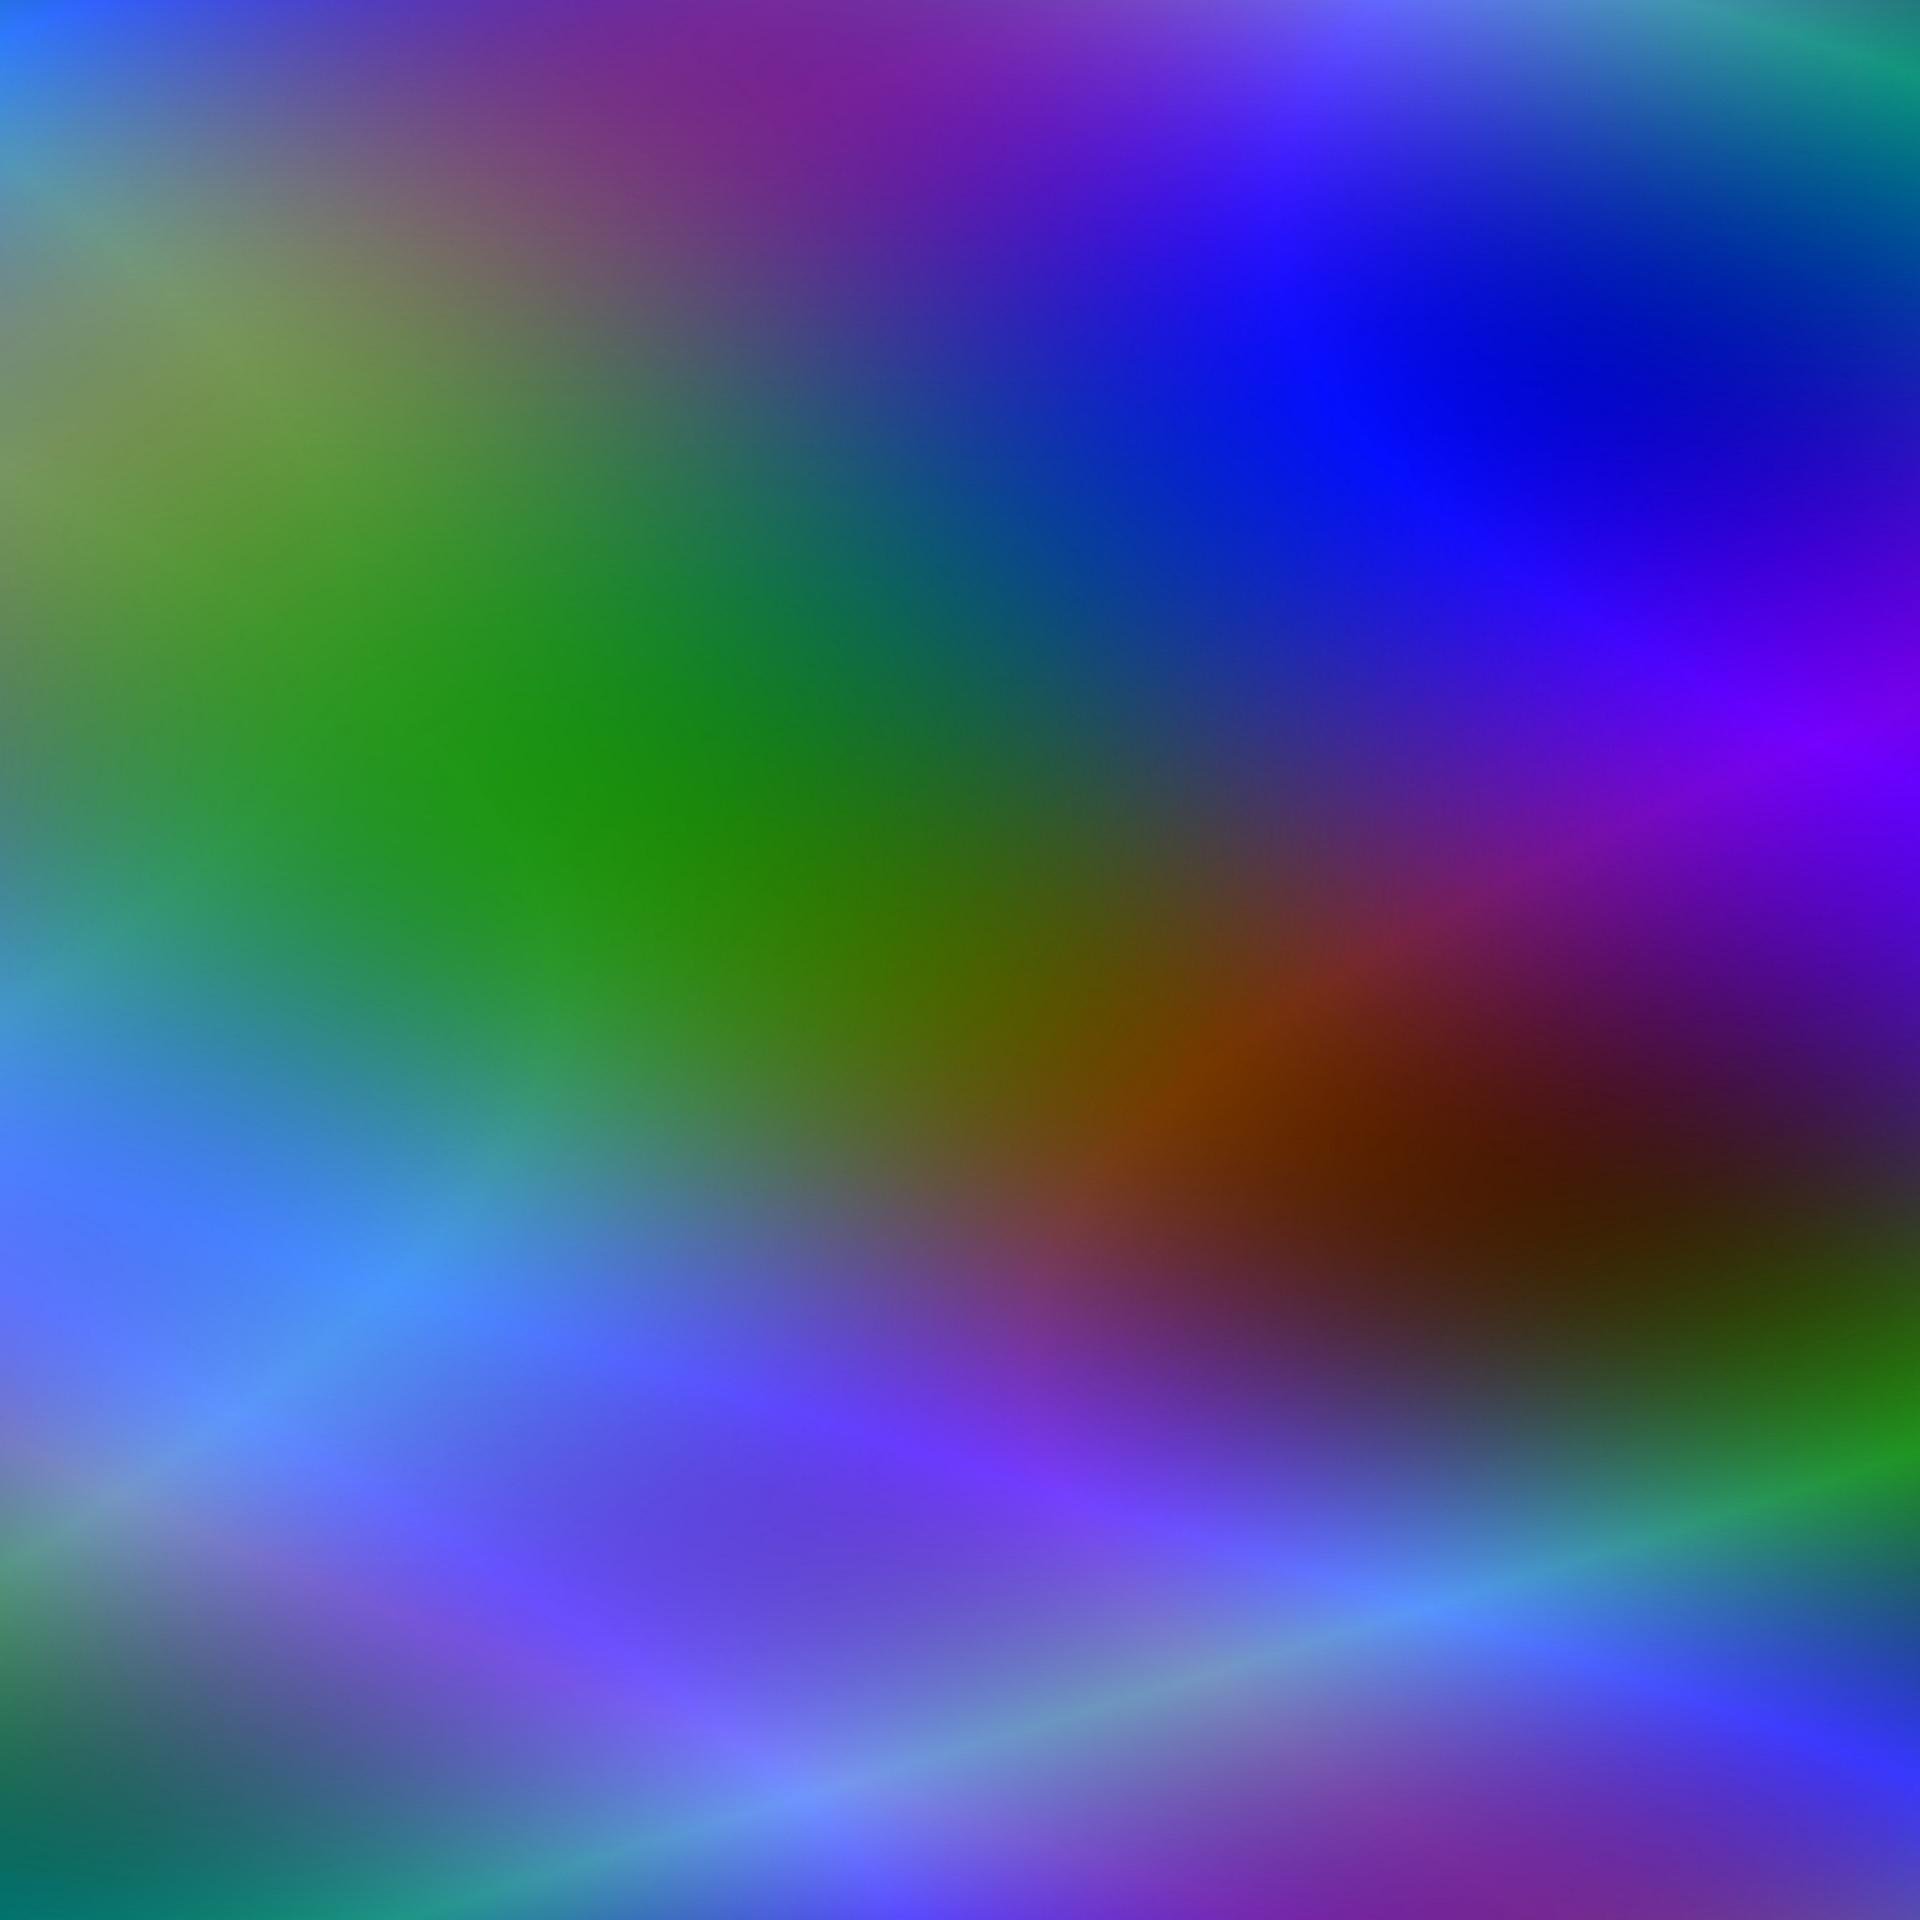 Wallpaper Color Plasma Free Photo - Colores Plasma - HD Wallpaper